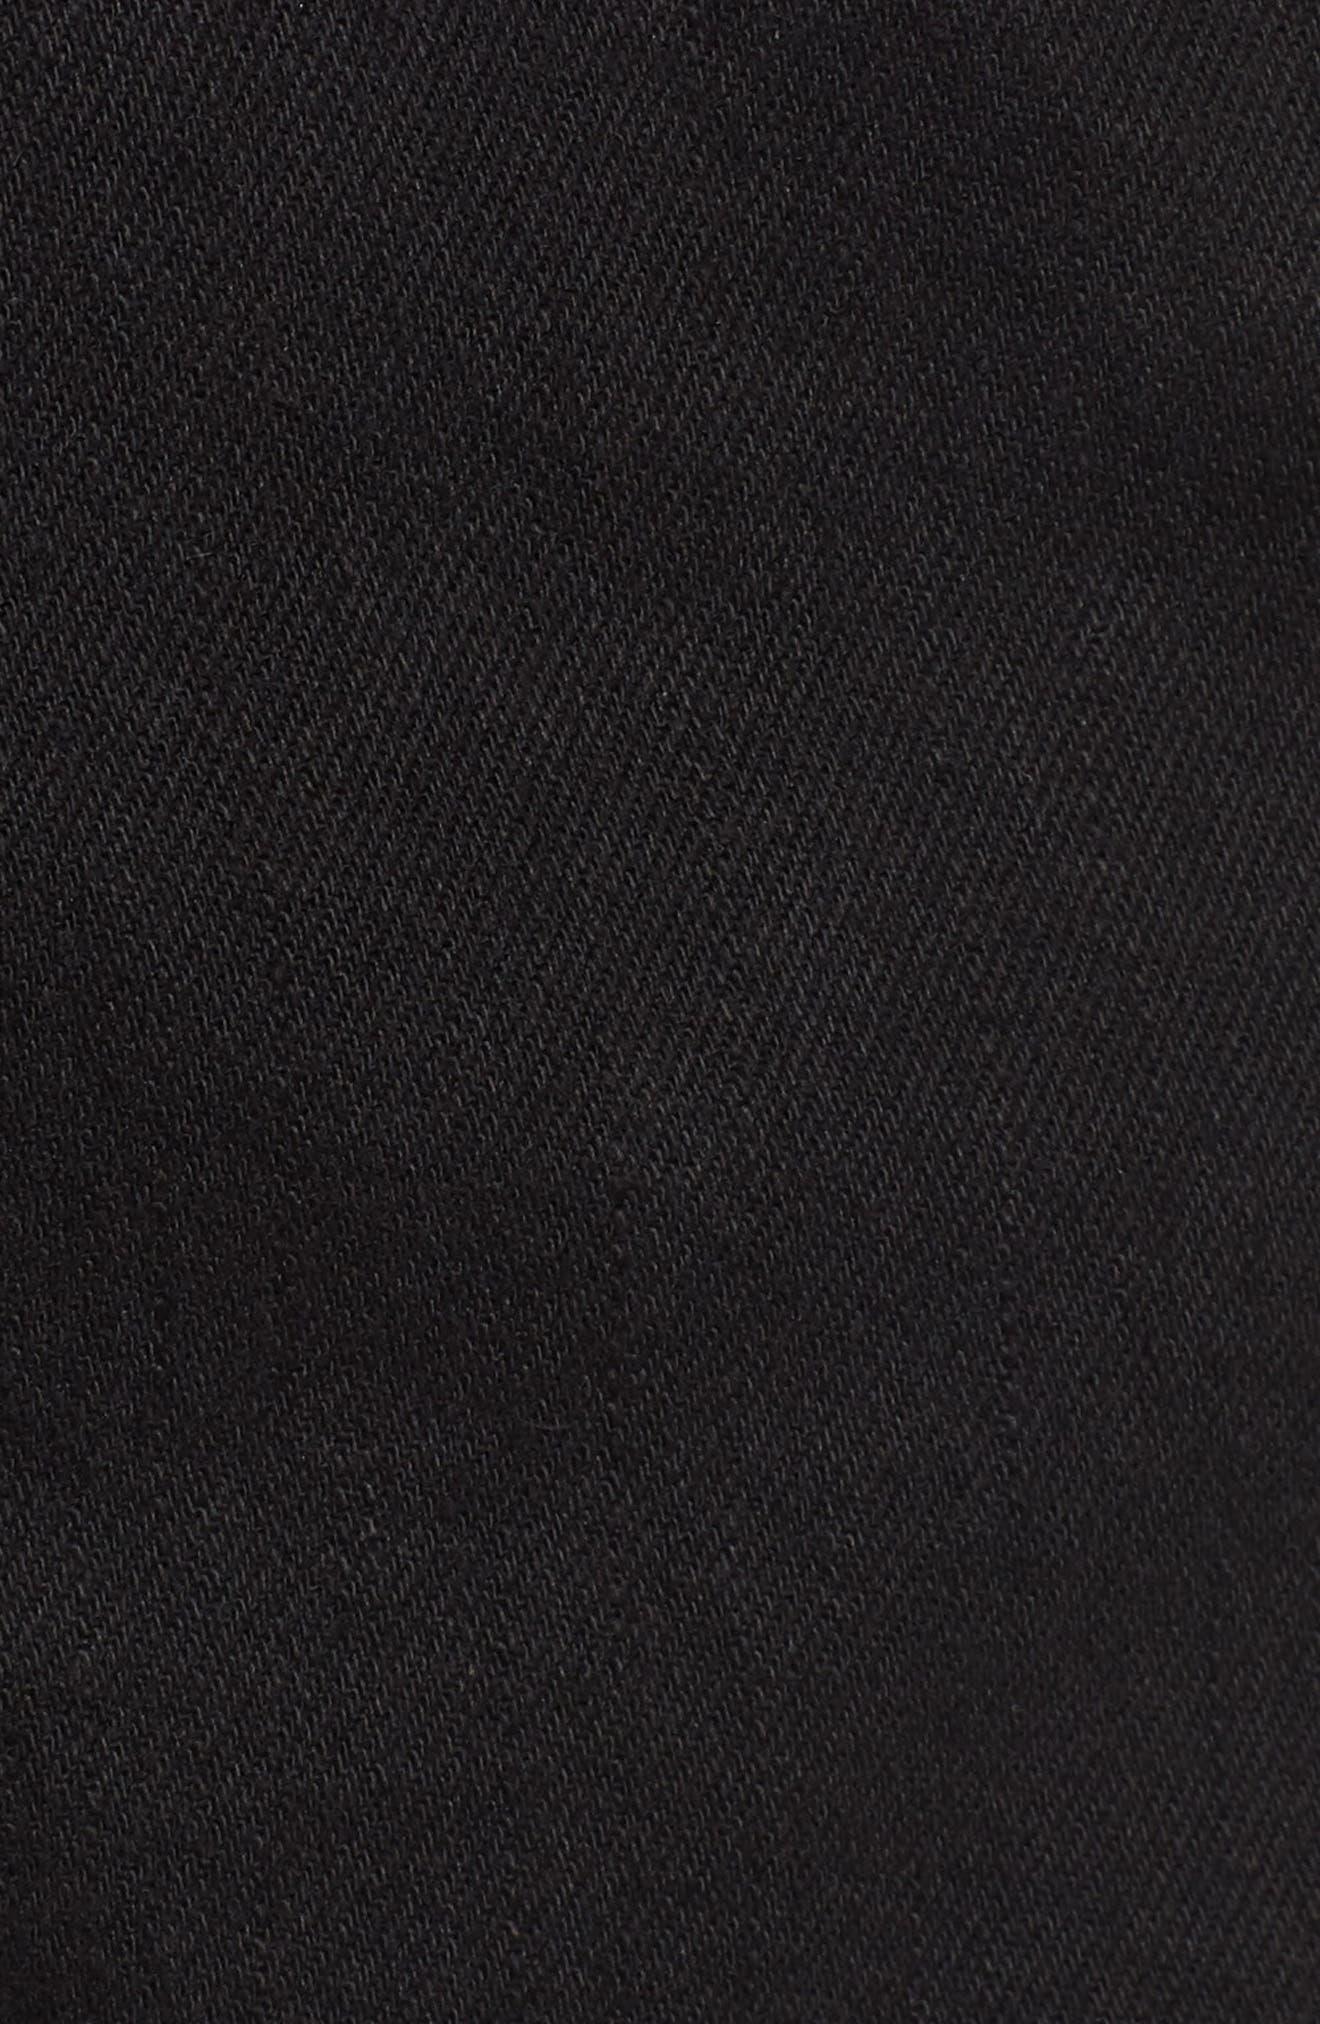 Vega Denim Shorts,                             Alternate thumbnail 6, color,                             001